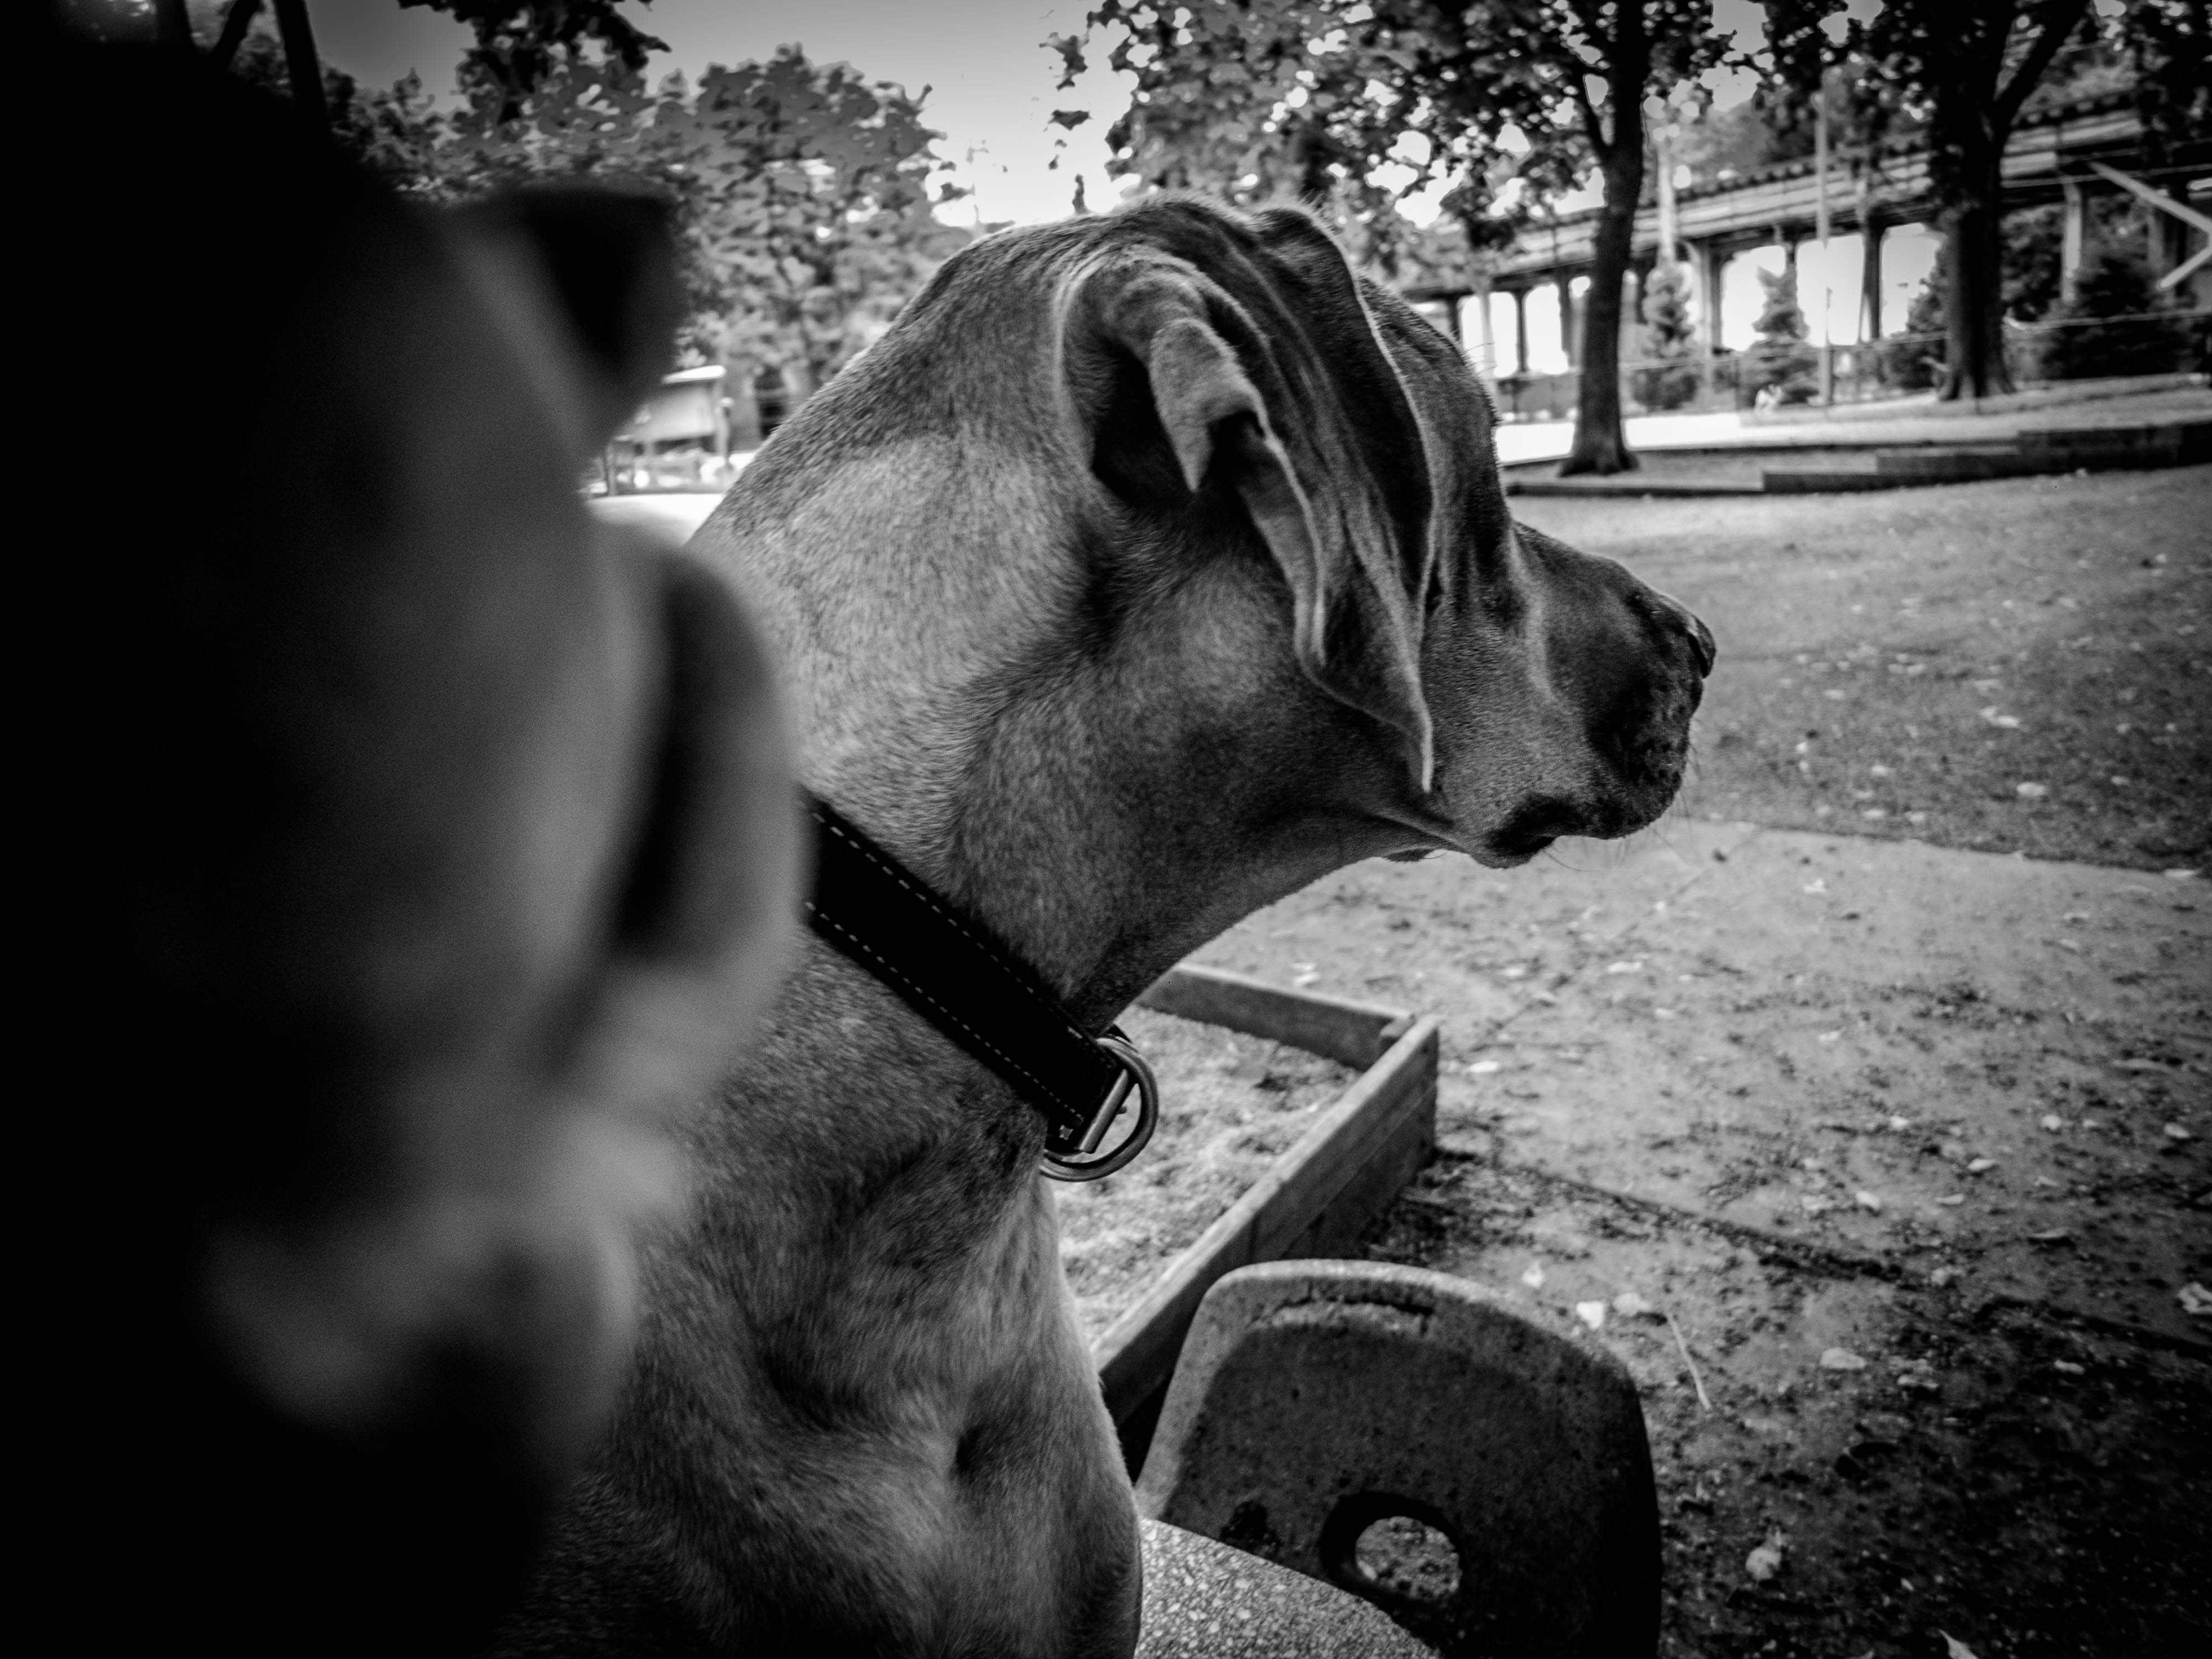 Rhodesian Ridgeback, Rhodesian Ridgeback Photos, dog adventure, marking our territory, petcentric, dog blog, pet blog, funny, dog selfie